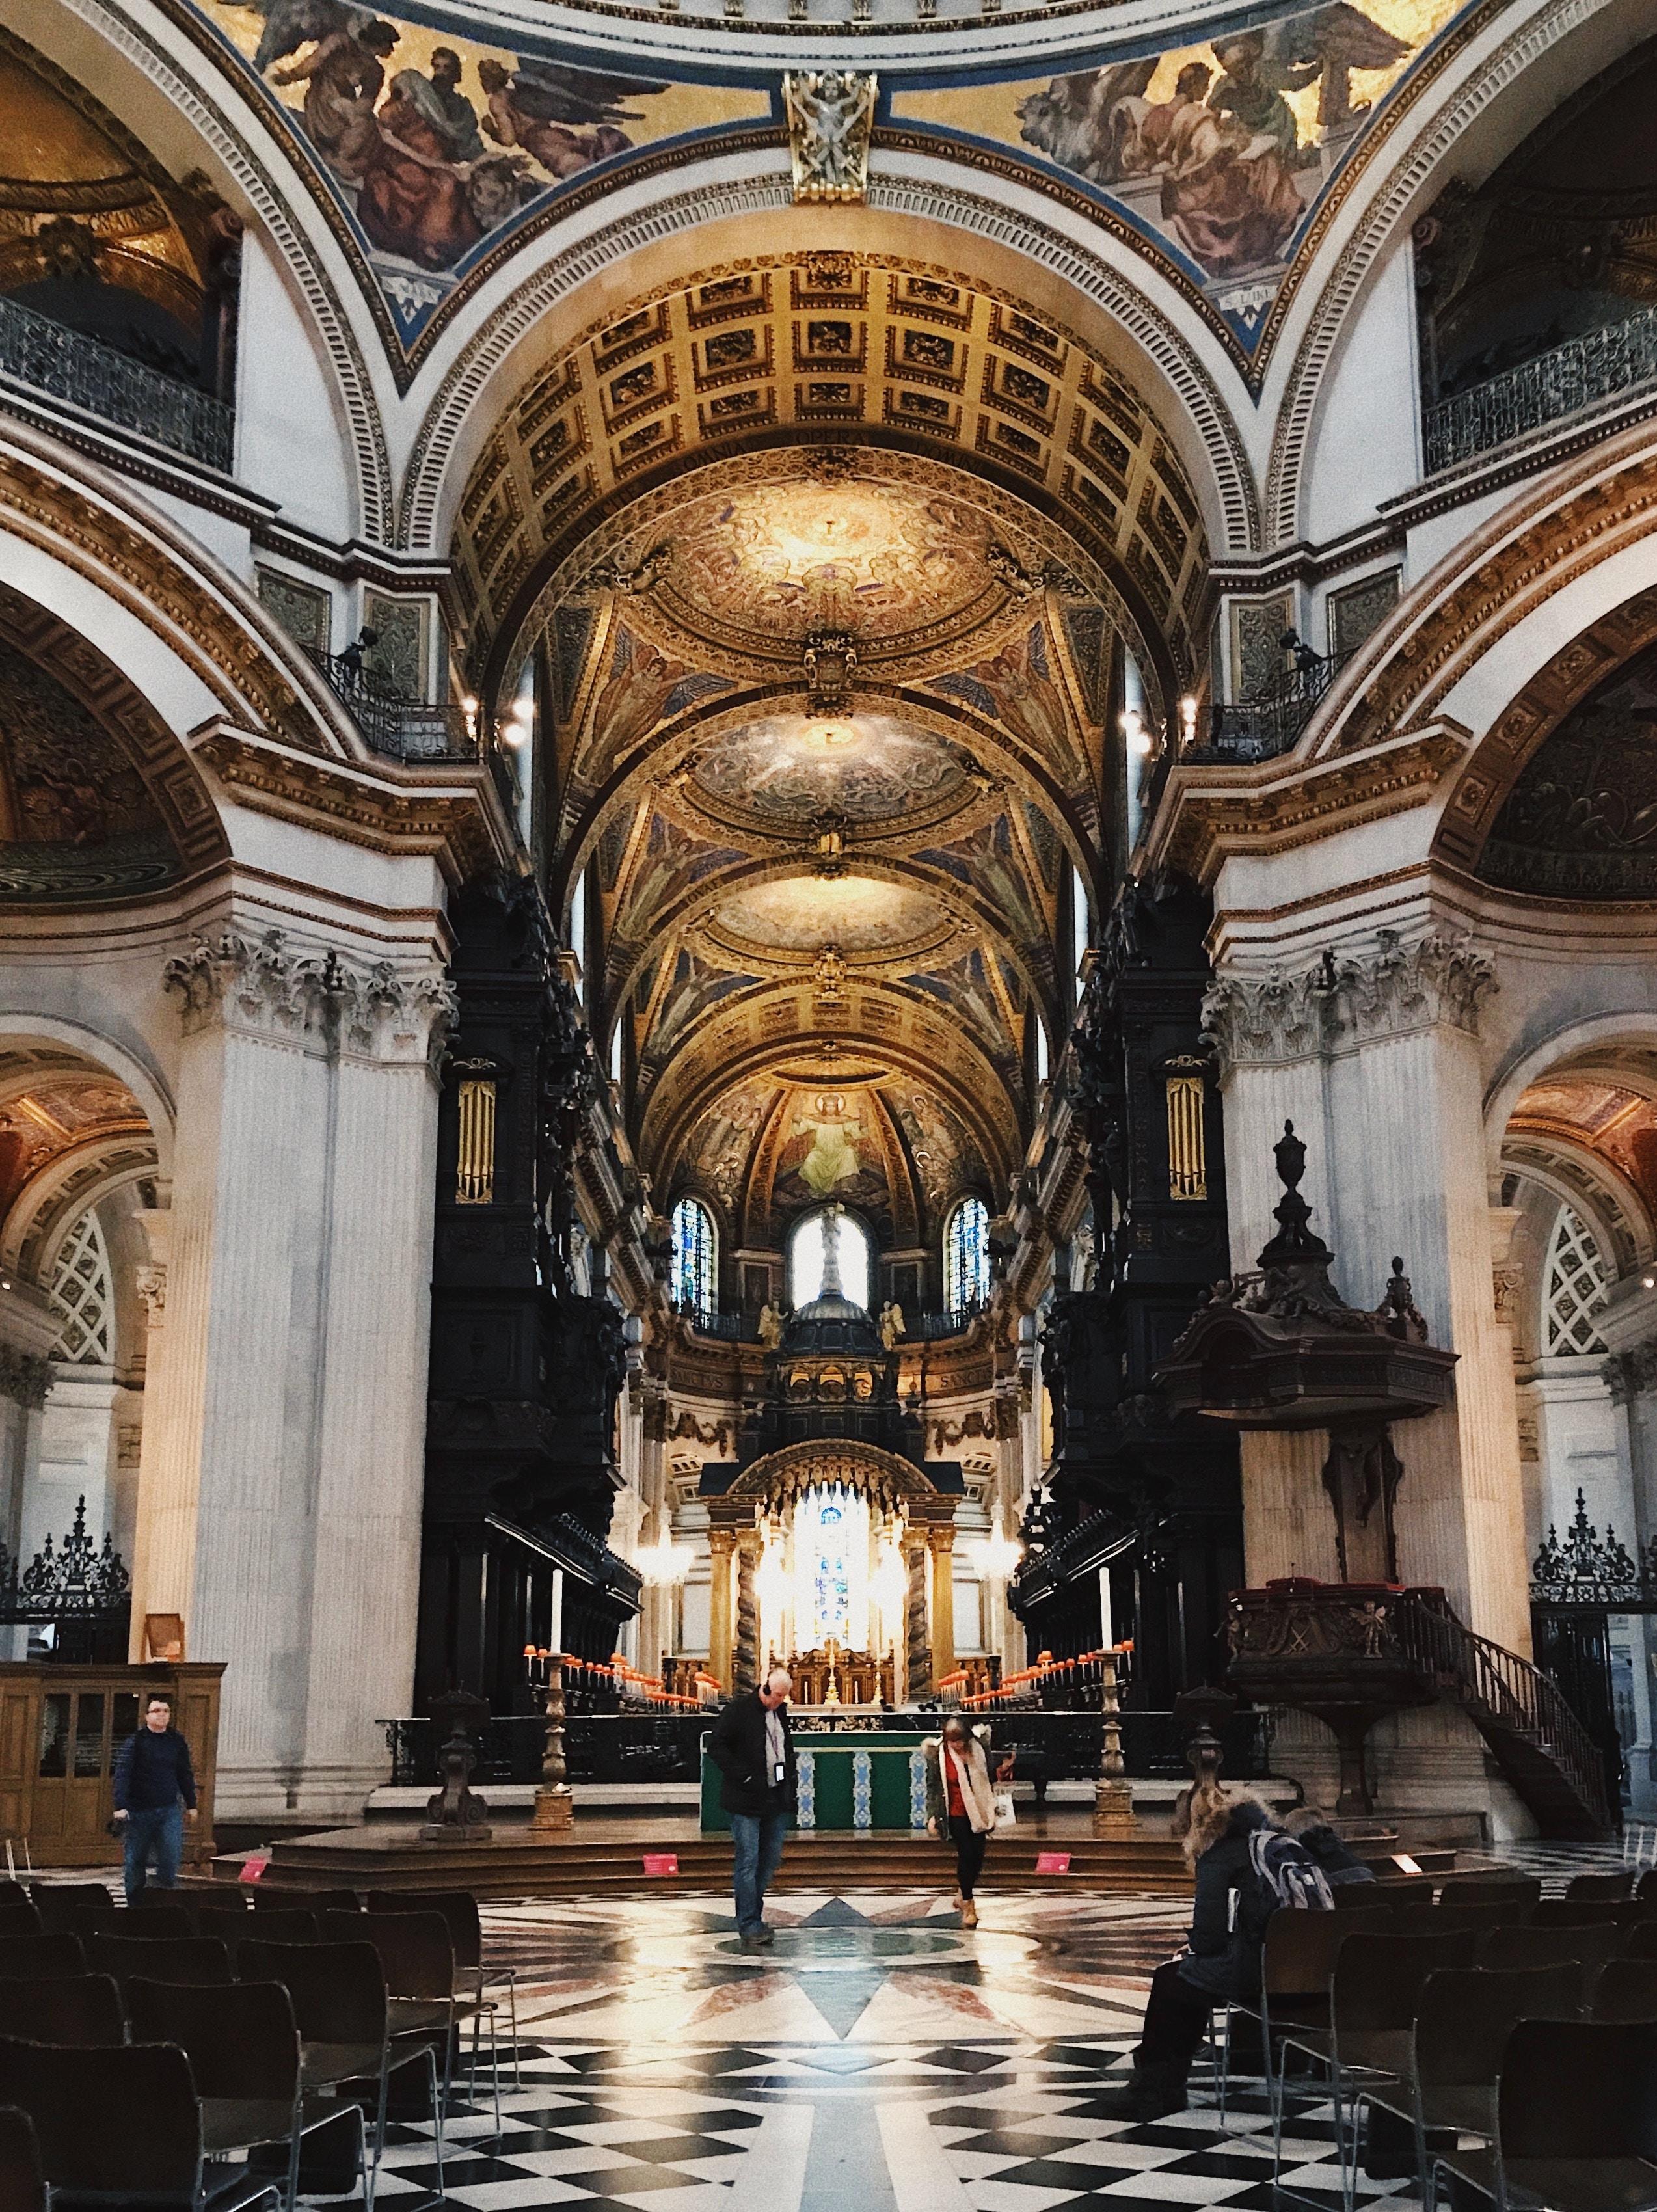 A church with high ceilings.